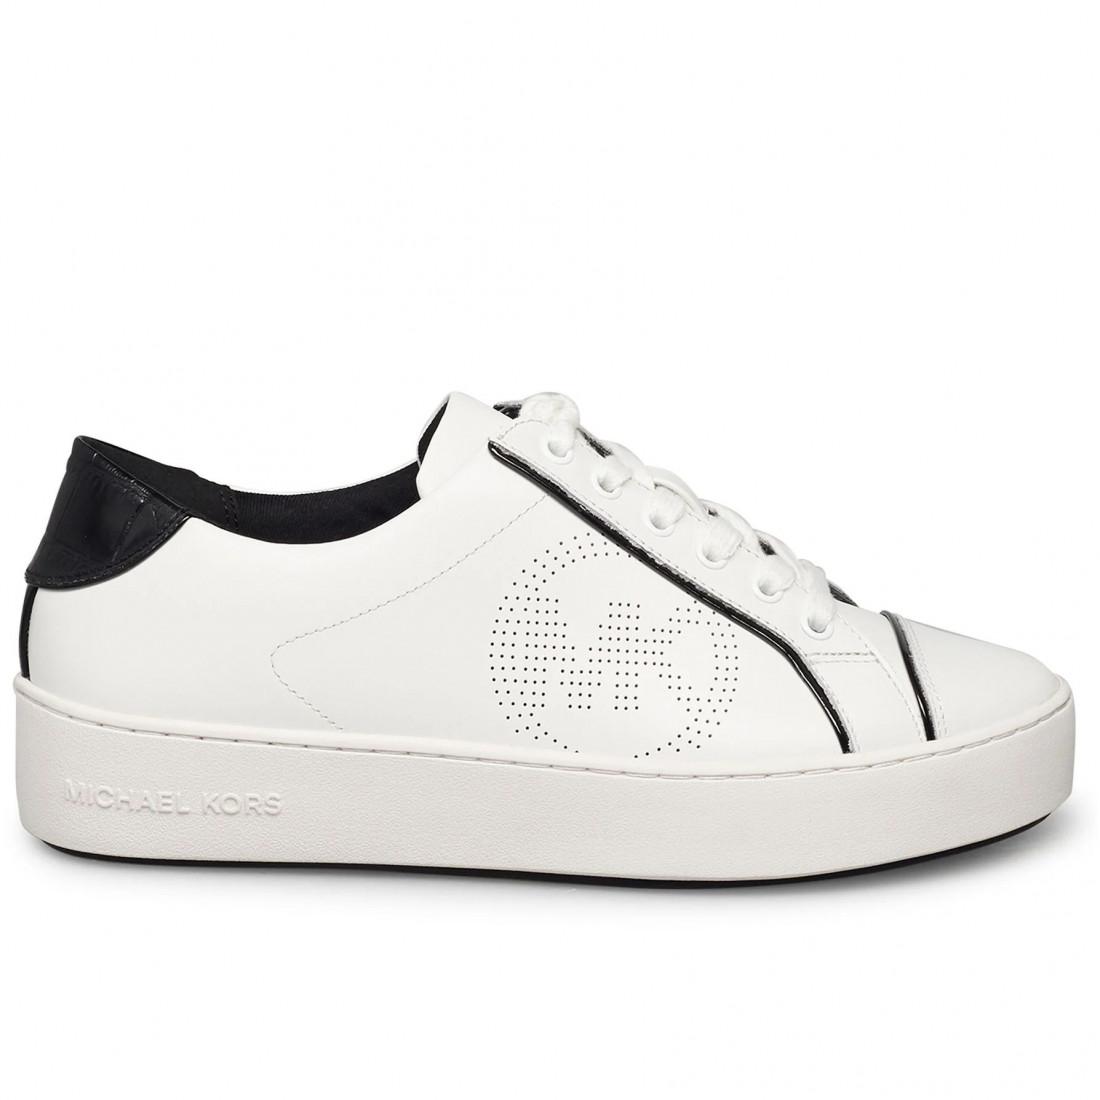 sneakers damen michael kors 43t0kbfs6l001 7522